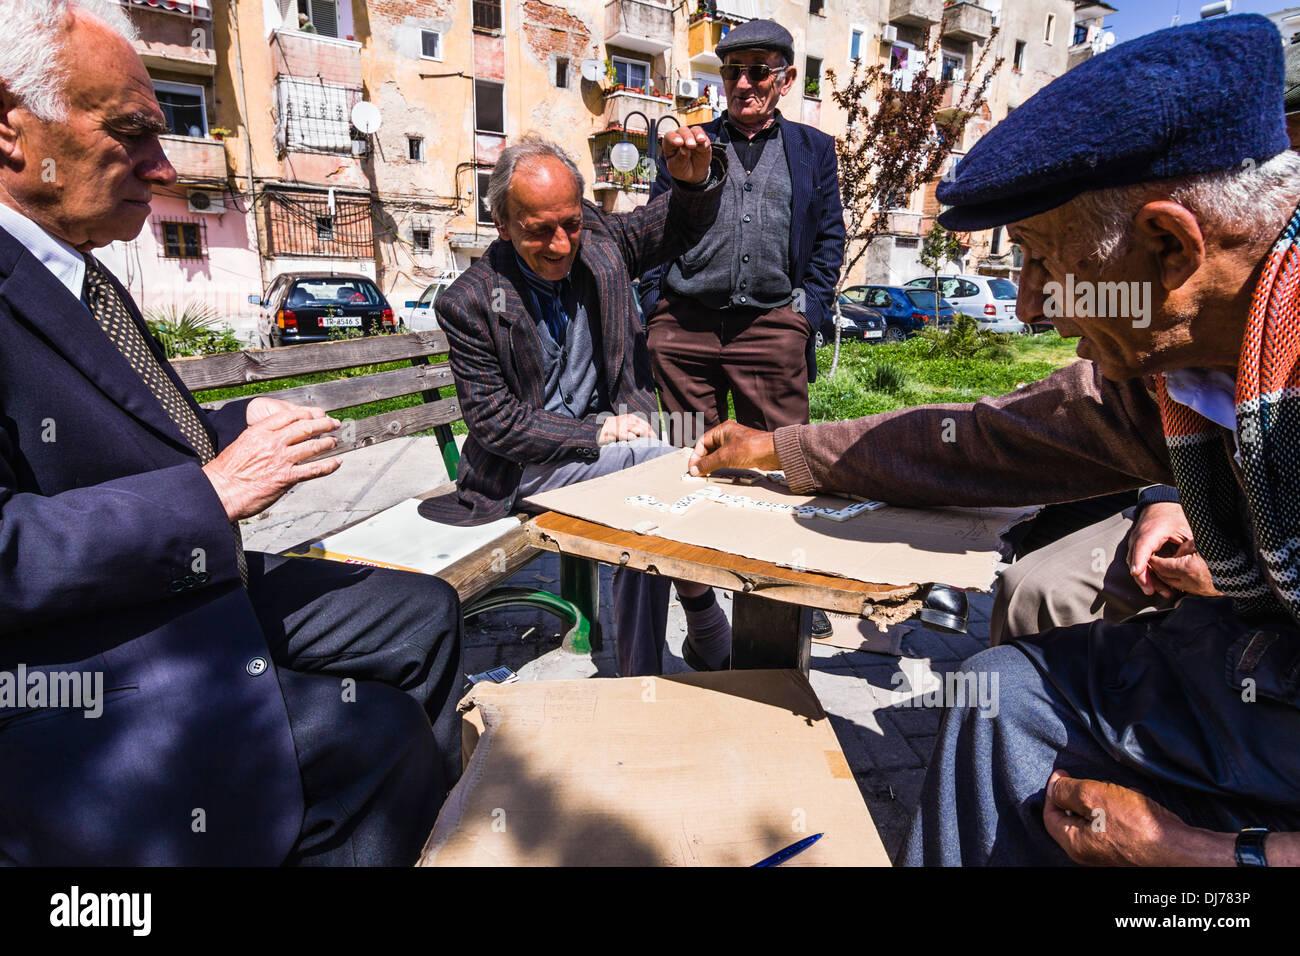 Old men playing domino in the street. Tirana, Albania - Stock Image